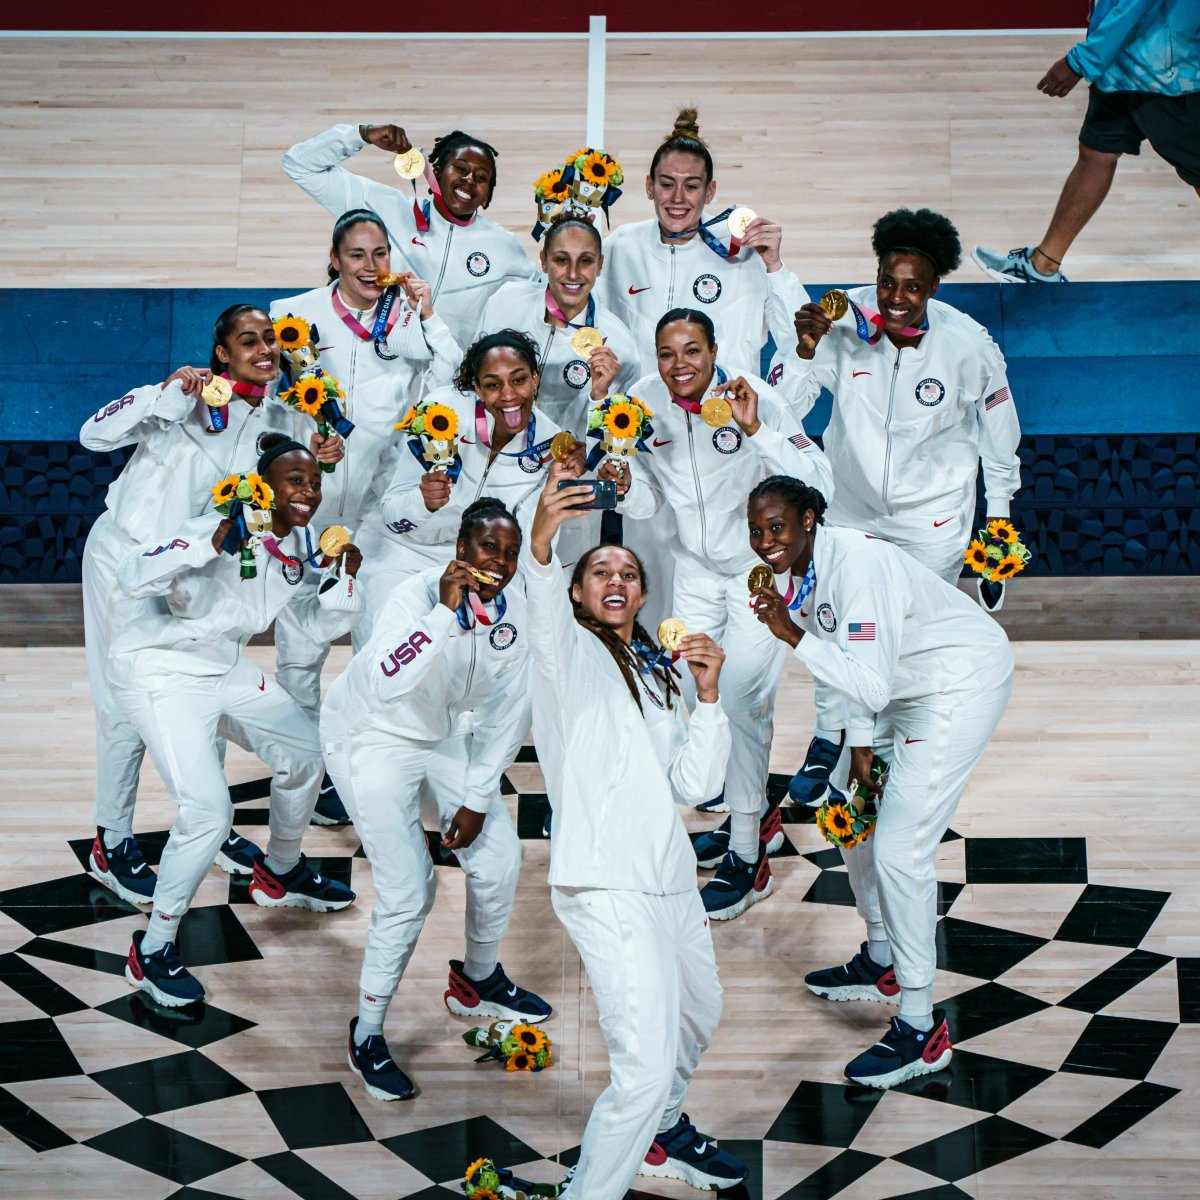 Tokio 2020: Estados Unidos campeona olímpica por séptima vez consecutiva